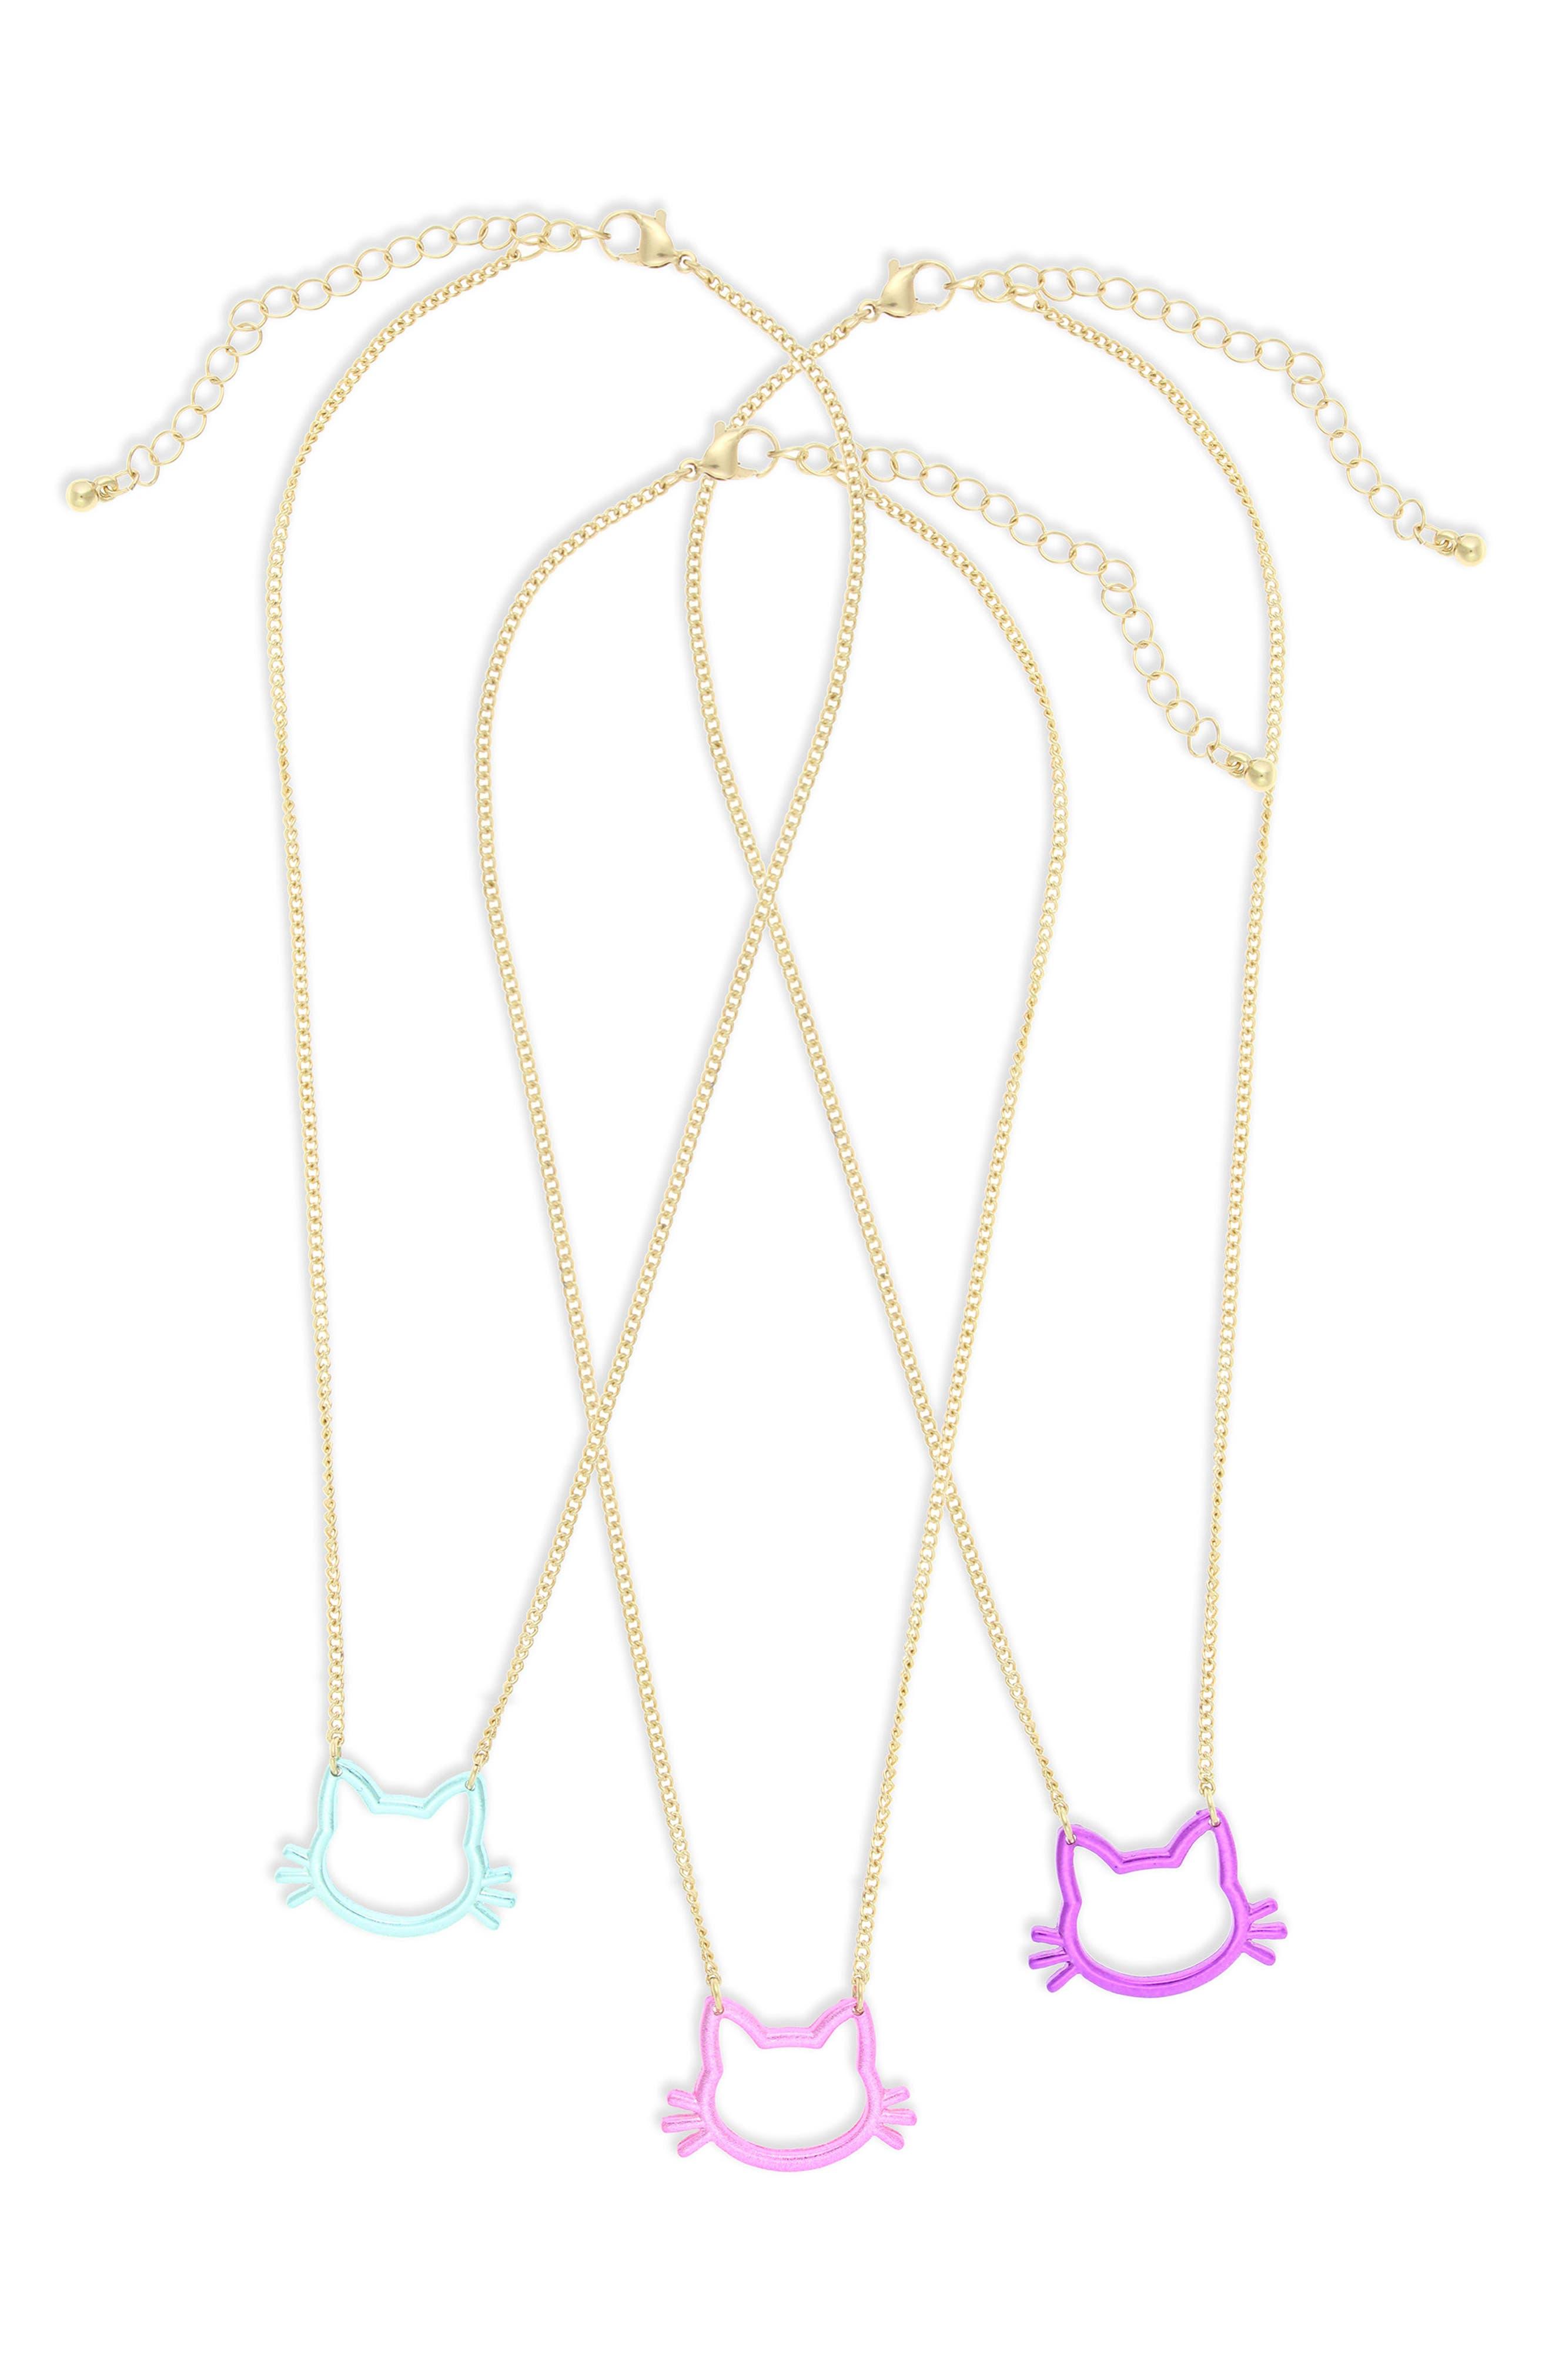 Main Image - Capelli New York Set of 3 Cat Pendant Necklaces (Girls)